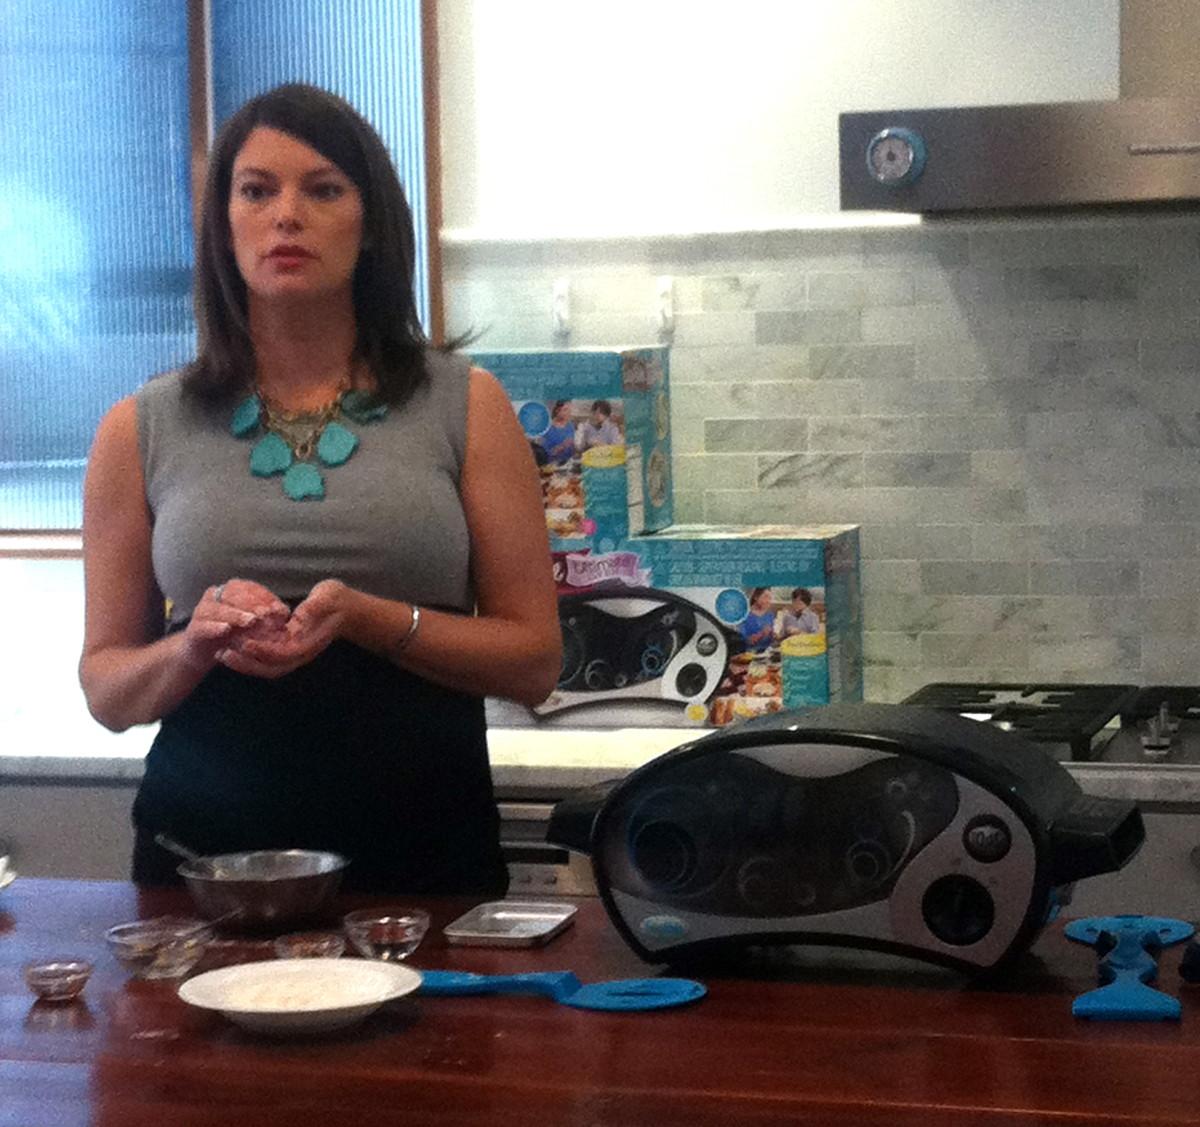 Easy-Bake Oven Demo, Gail Simmons